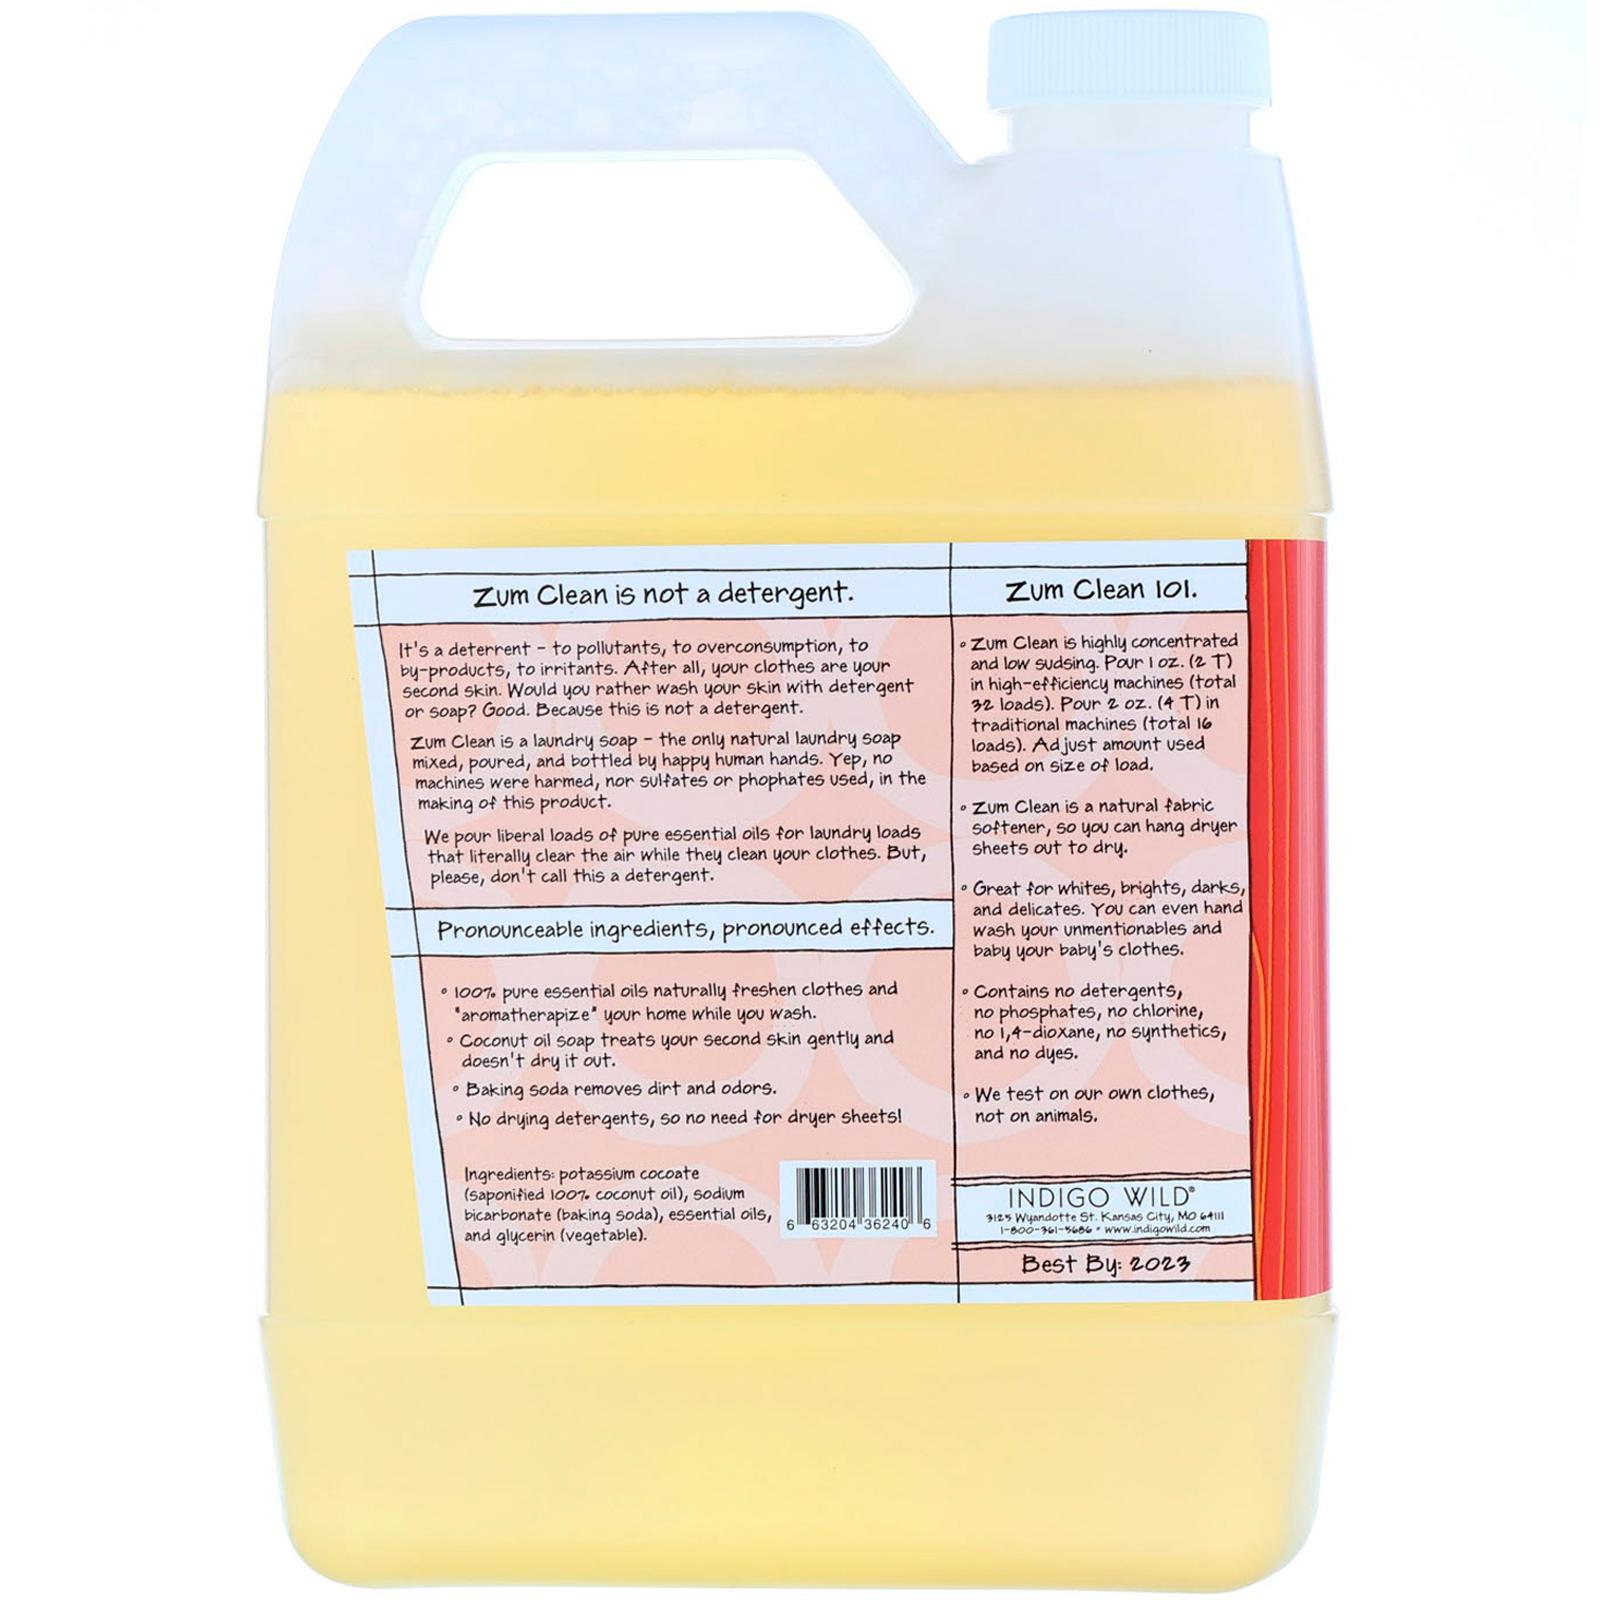 Indigo Wild Zum Clean Aromatherapy Laundry Soap Sweet Orange